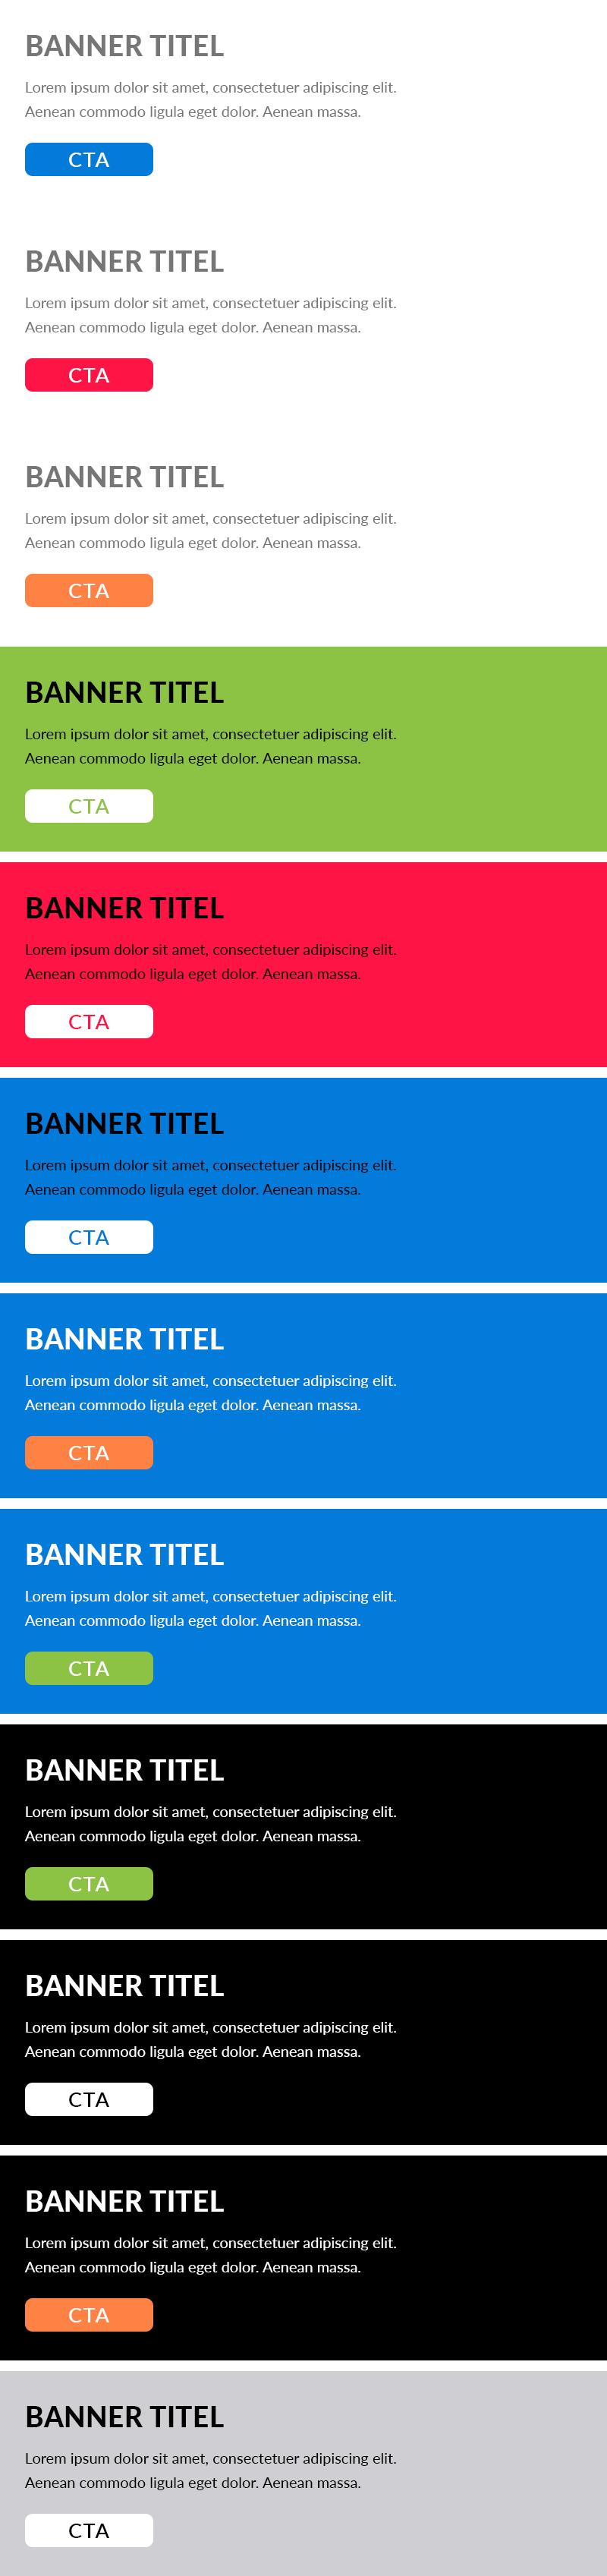 cta banners